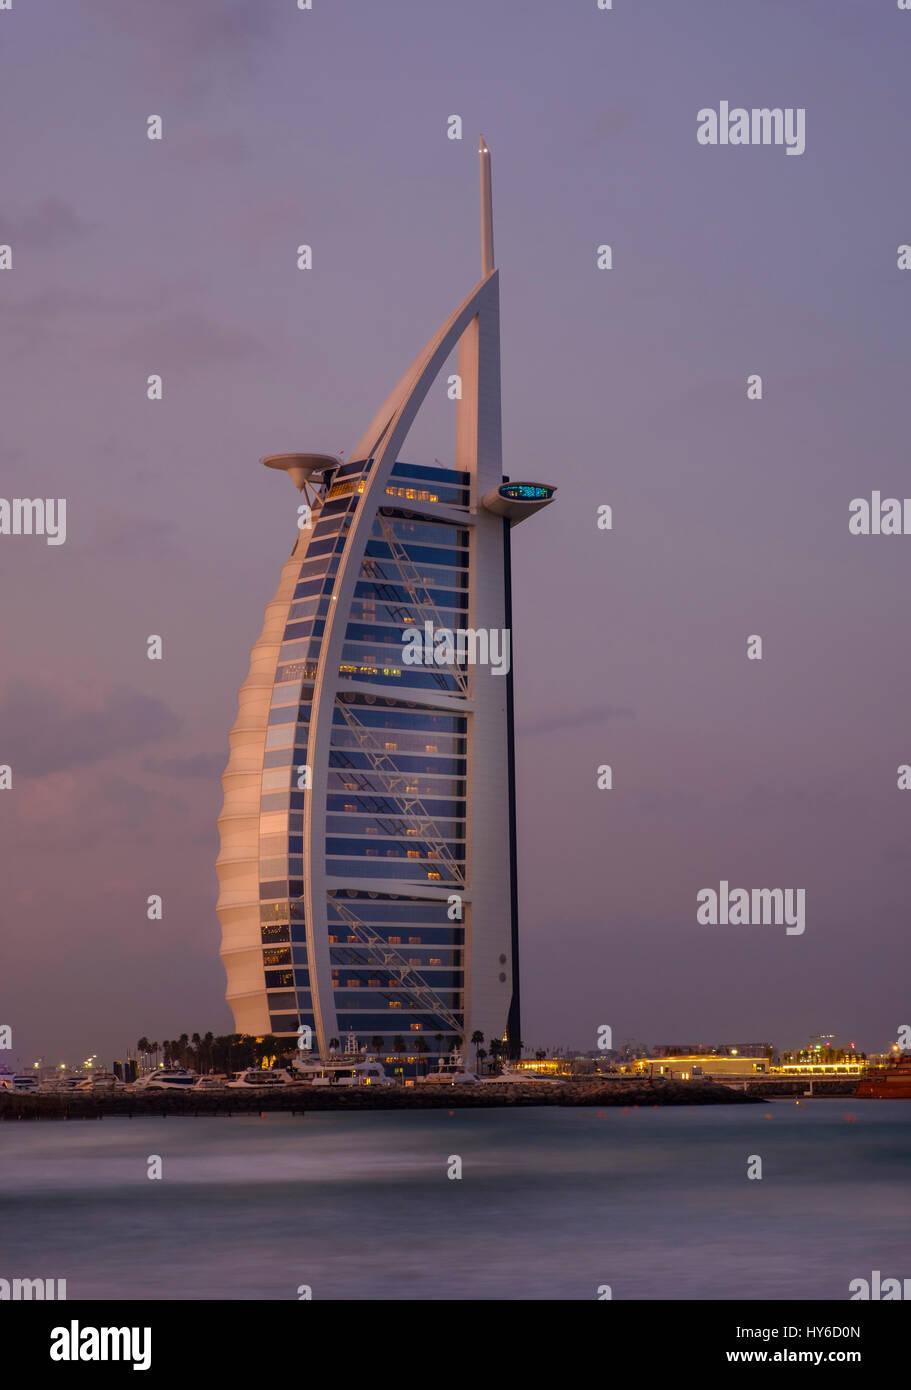 UNITED ARAB EMIRATES, DUBAI - CIRCA JANUARY 2017:  Burj Al Arab at dawn, the only 7 star hotel in the world. - Stock Image